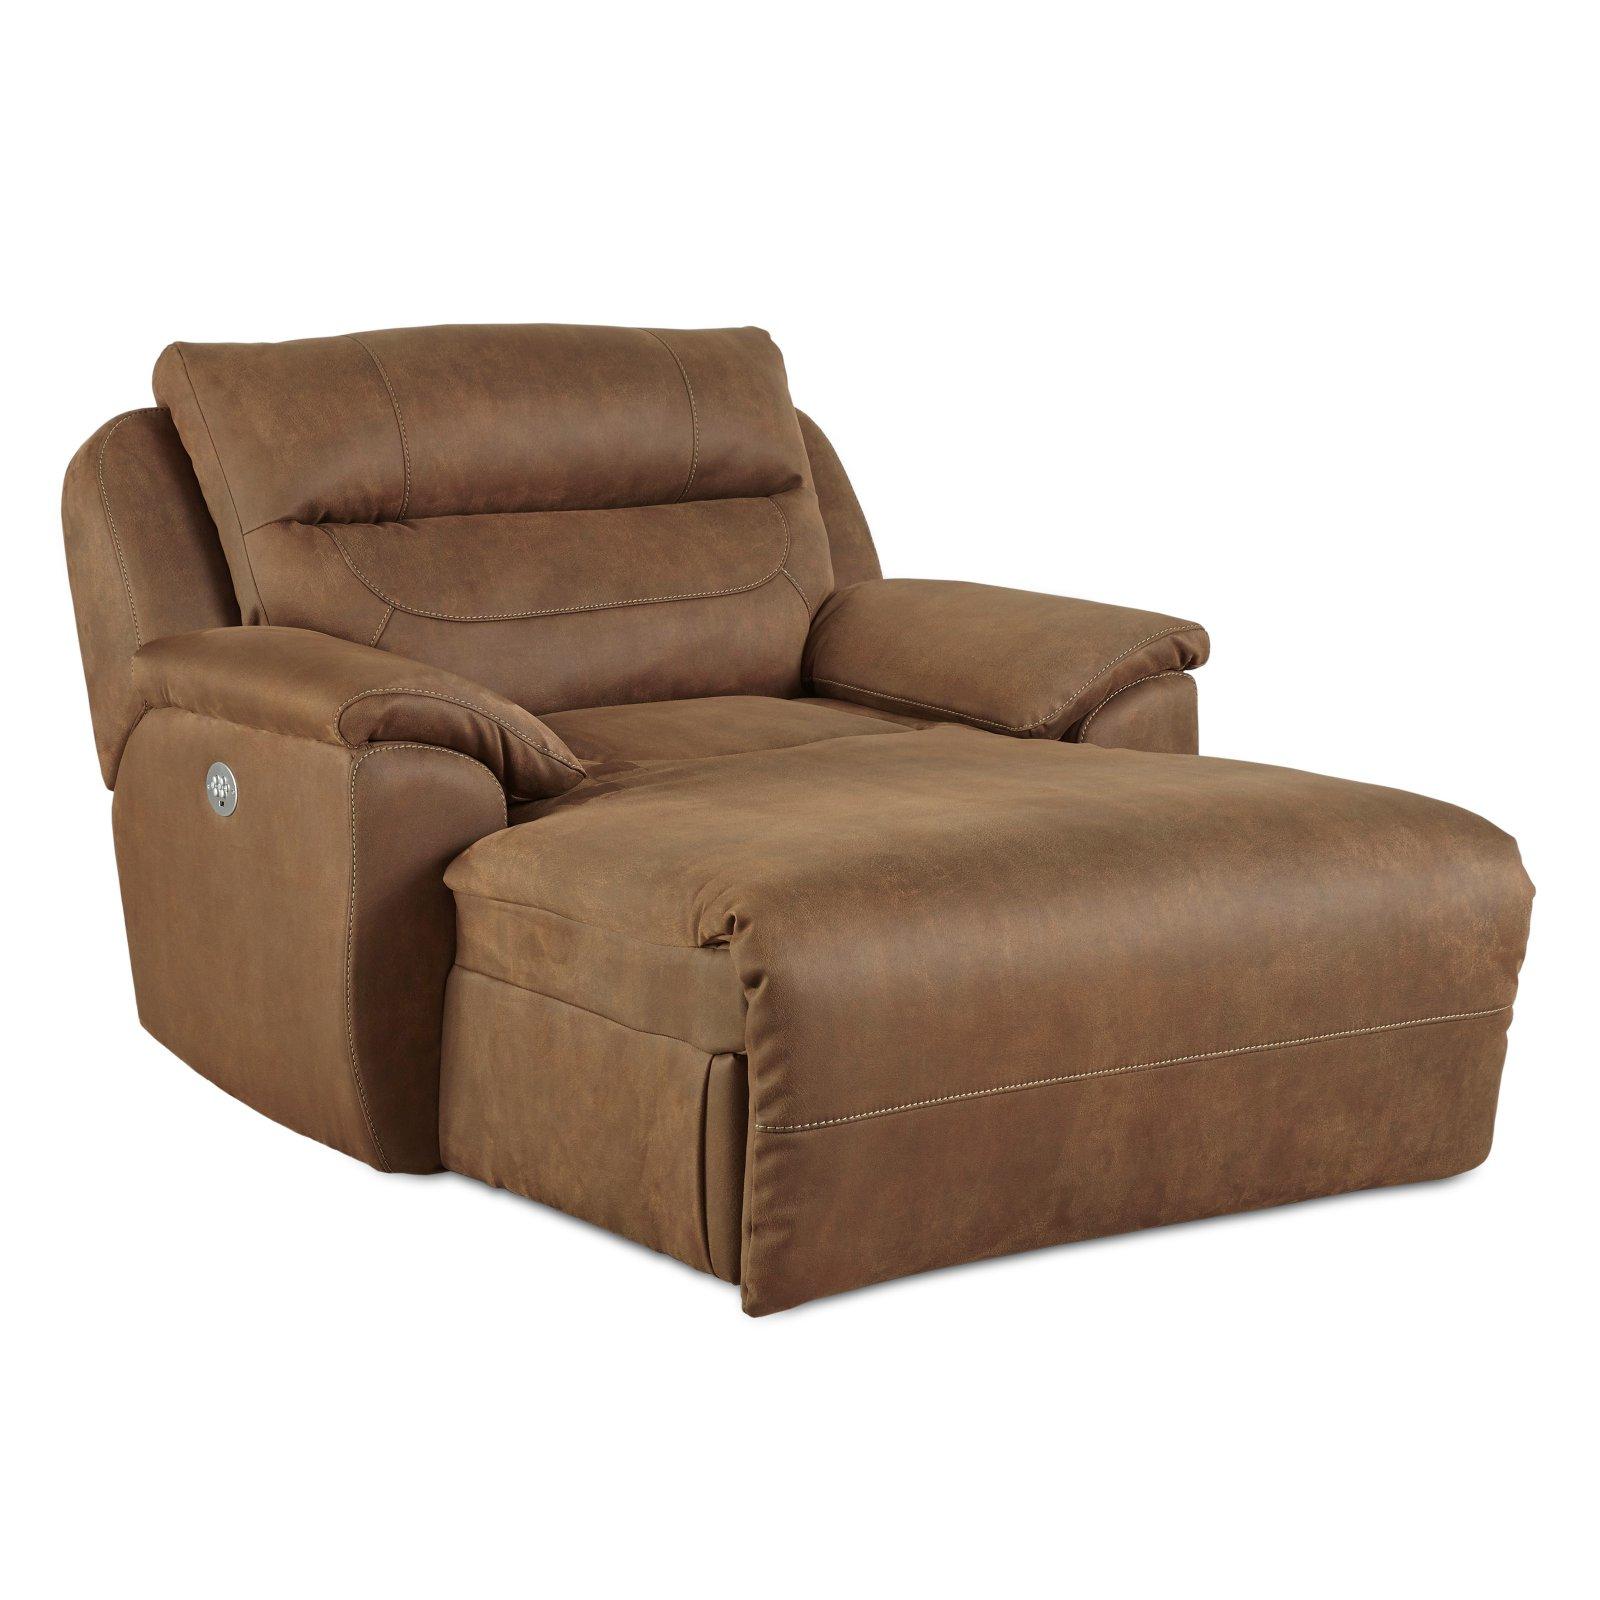 Enjoyable Recline Designs Pinnacle Chair And A Half Chaise With Power Frankydiablos Diy Chair Ideas Frankydiabloscom